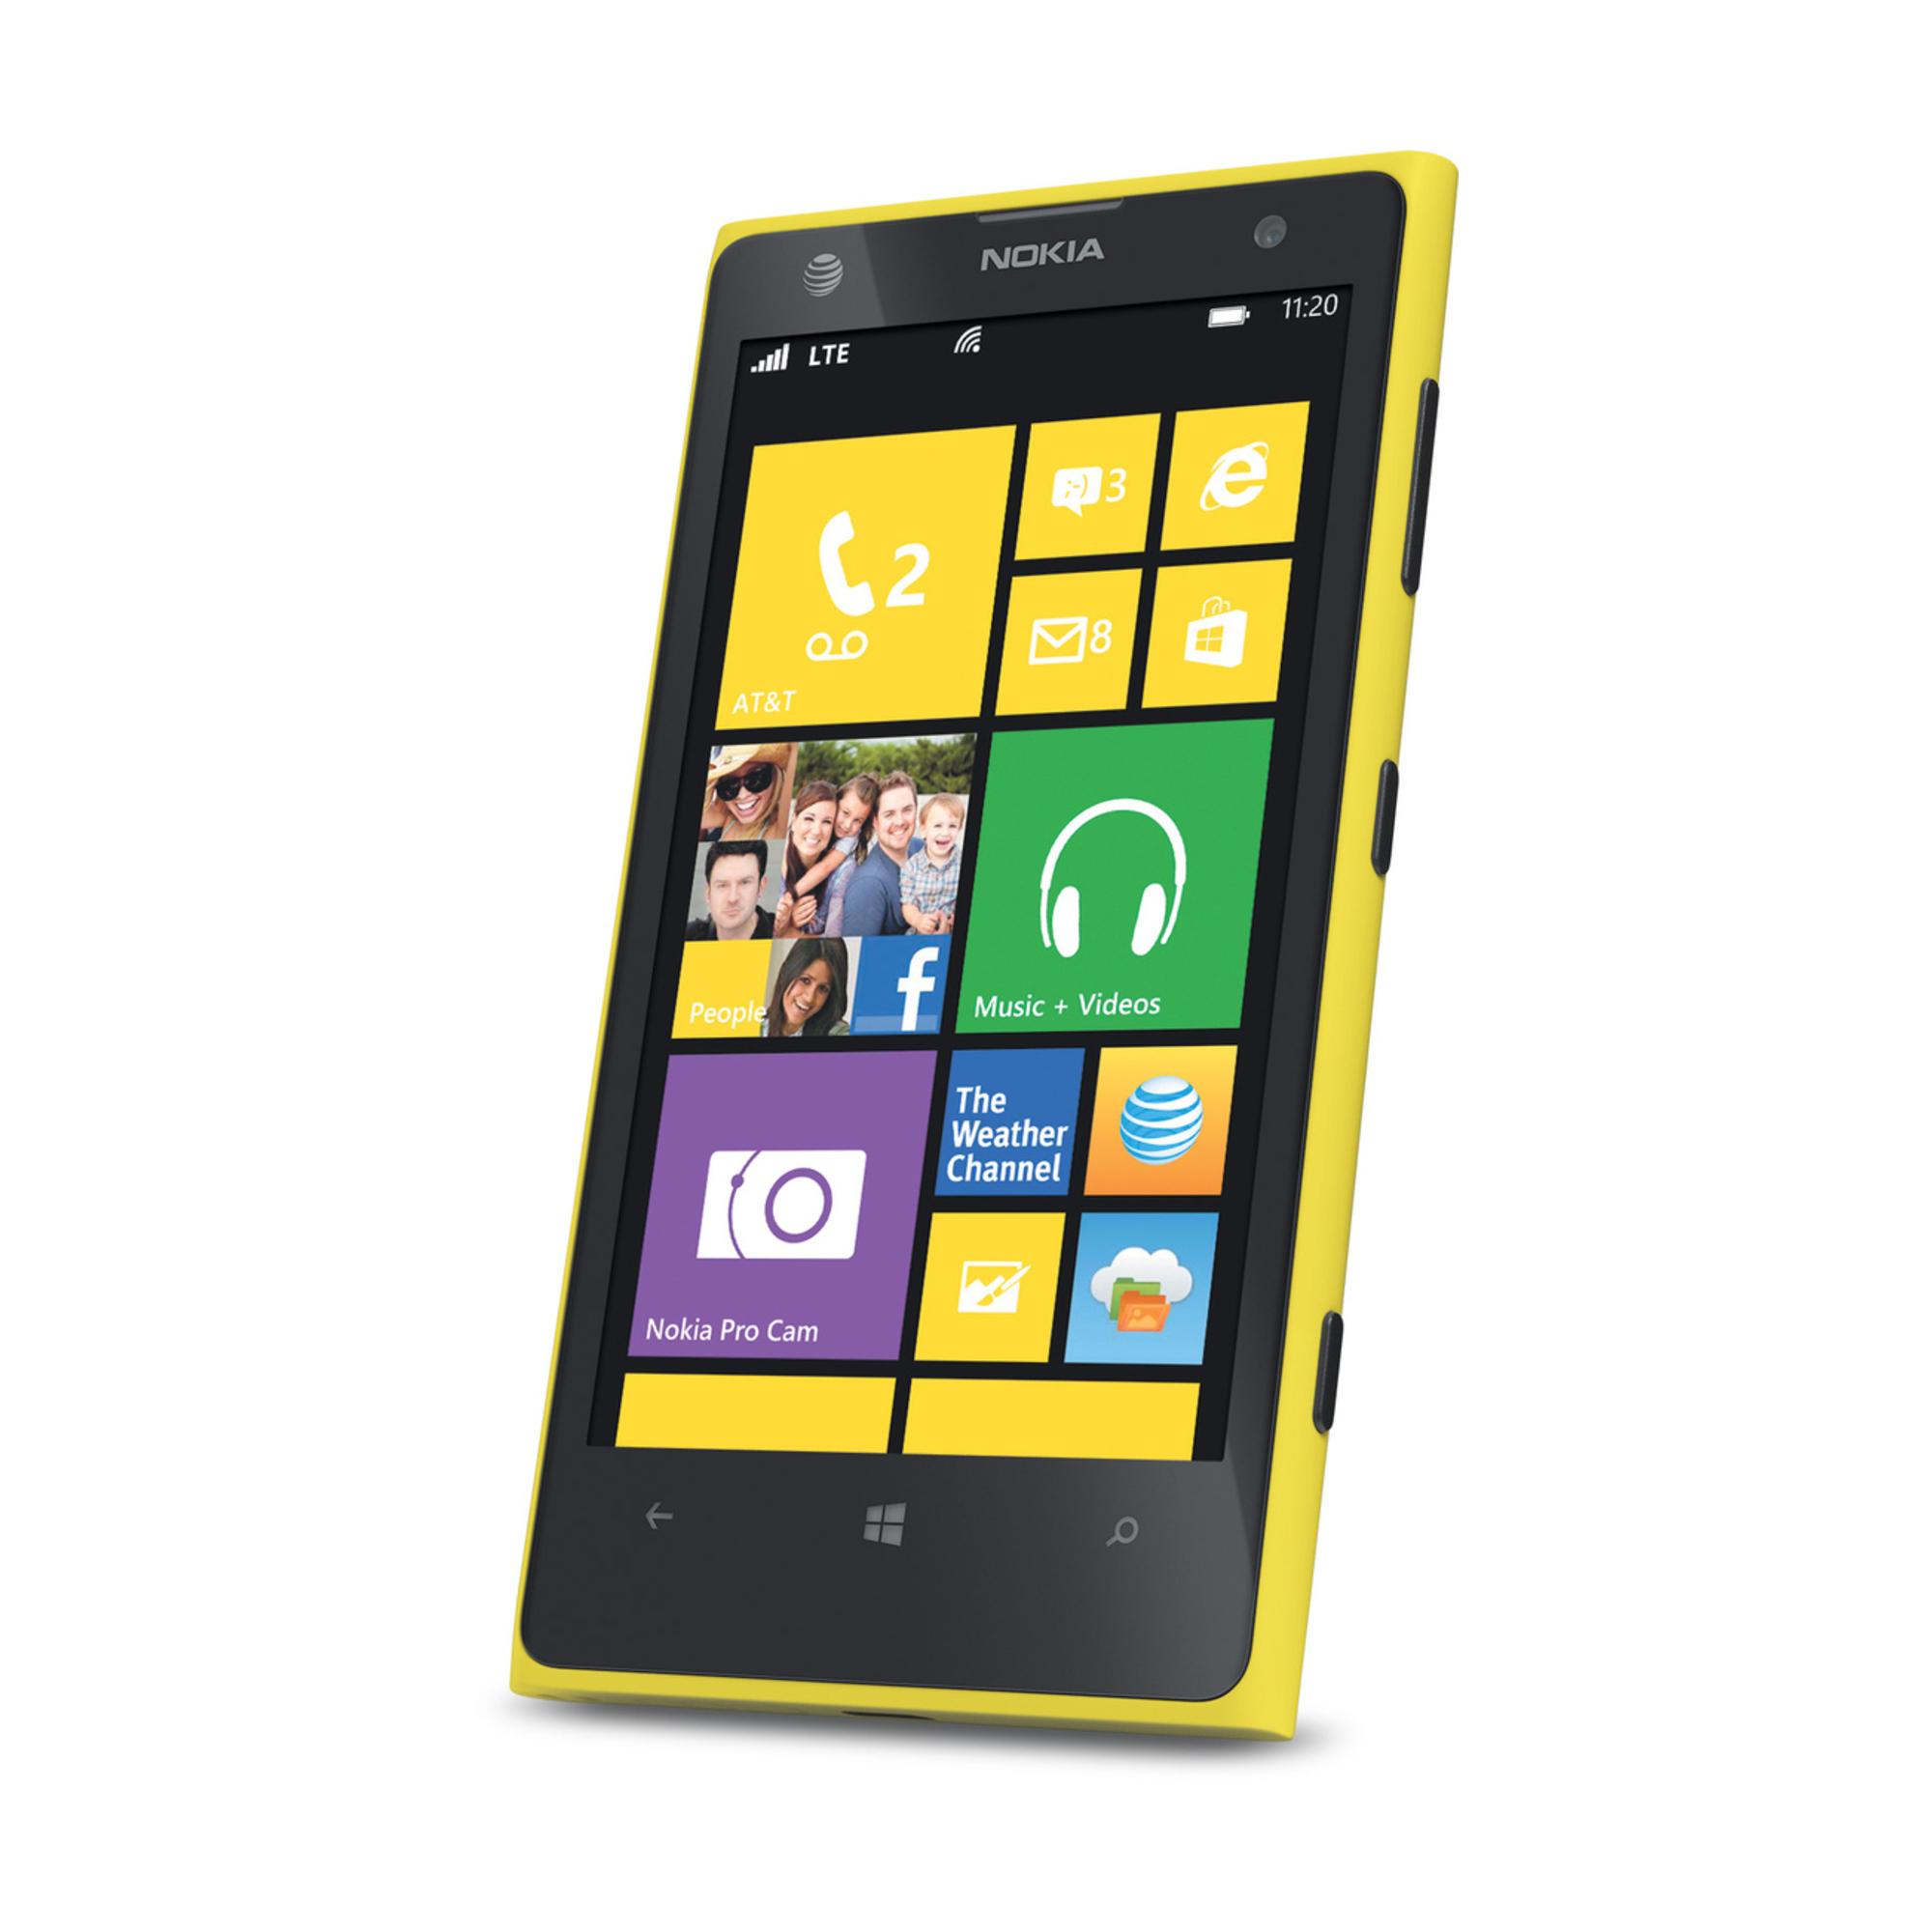 Nokia Lumia 1020 review - The Verge